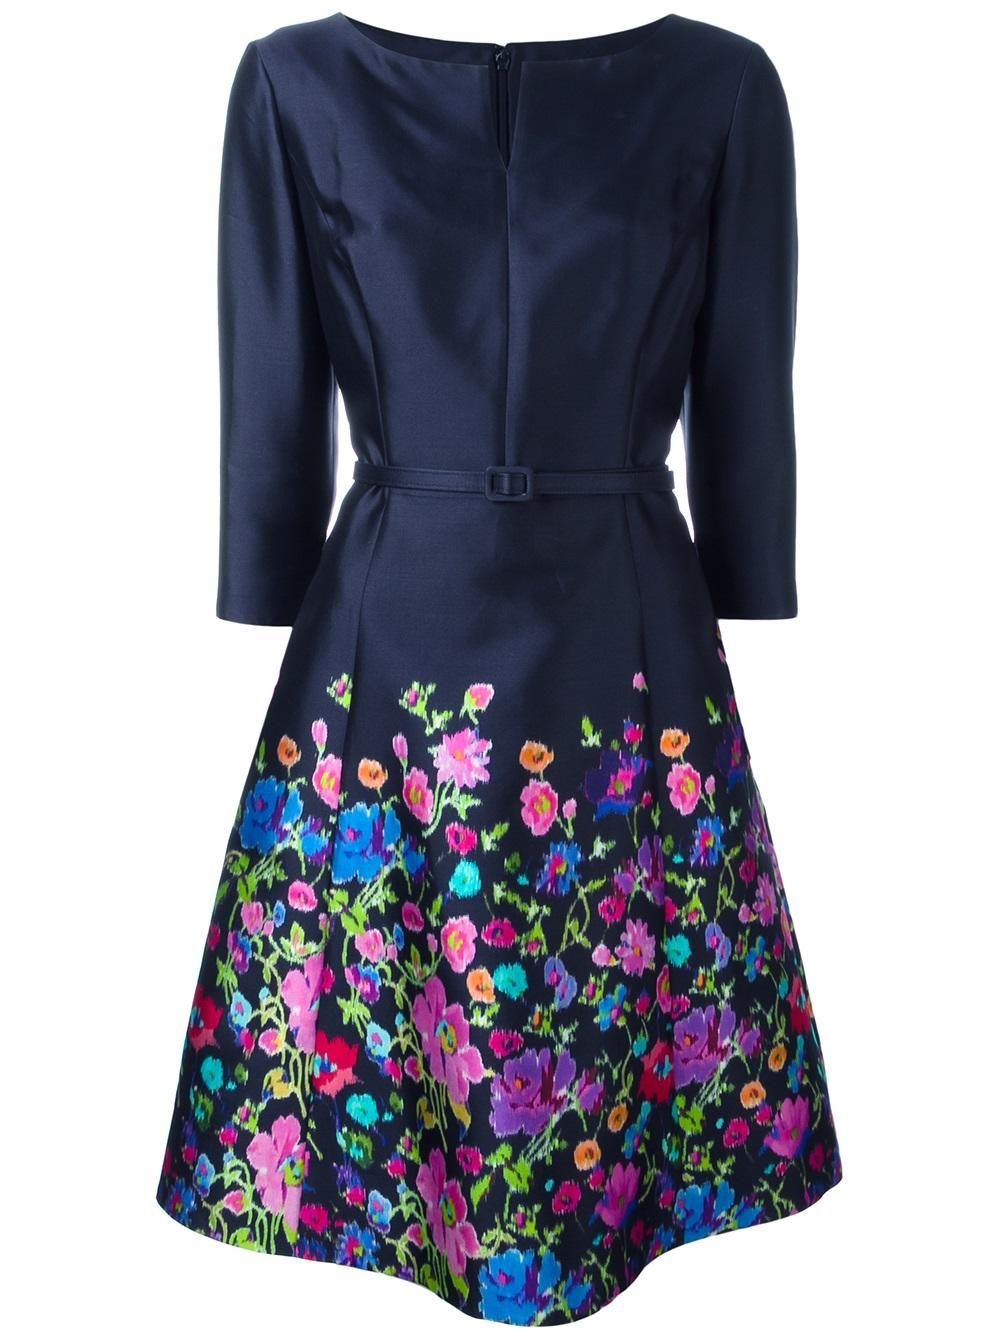 Oscar De La Renta Woman Floral-print Cotton-poplin Dress Fuchsia Size 8 Oscar De La Renta The Cheapest Sale Online 98TUedlkJ